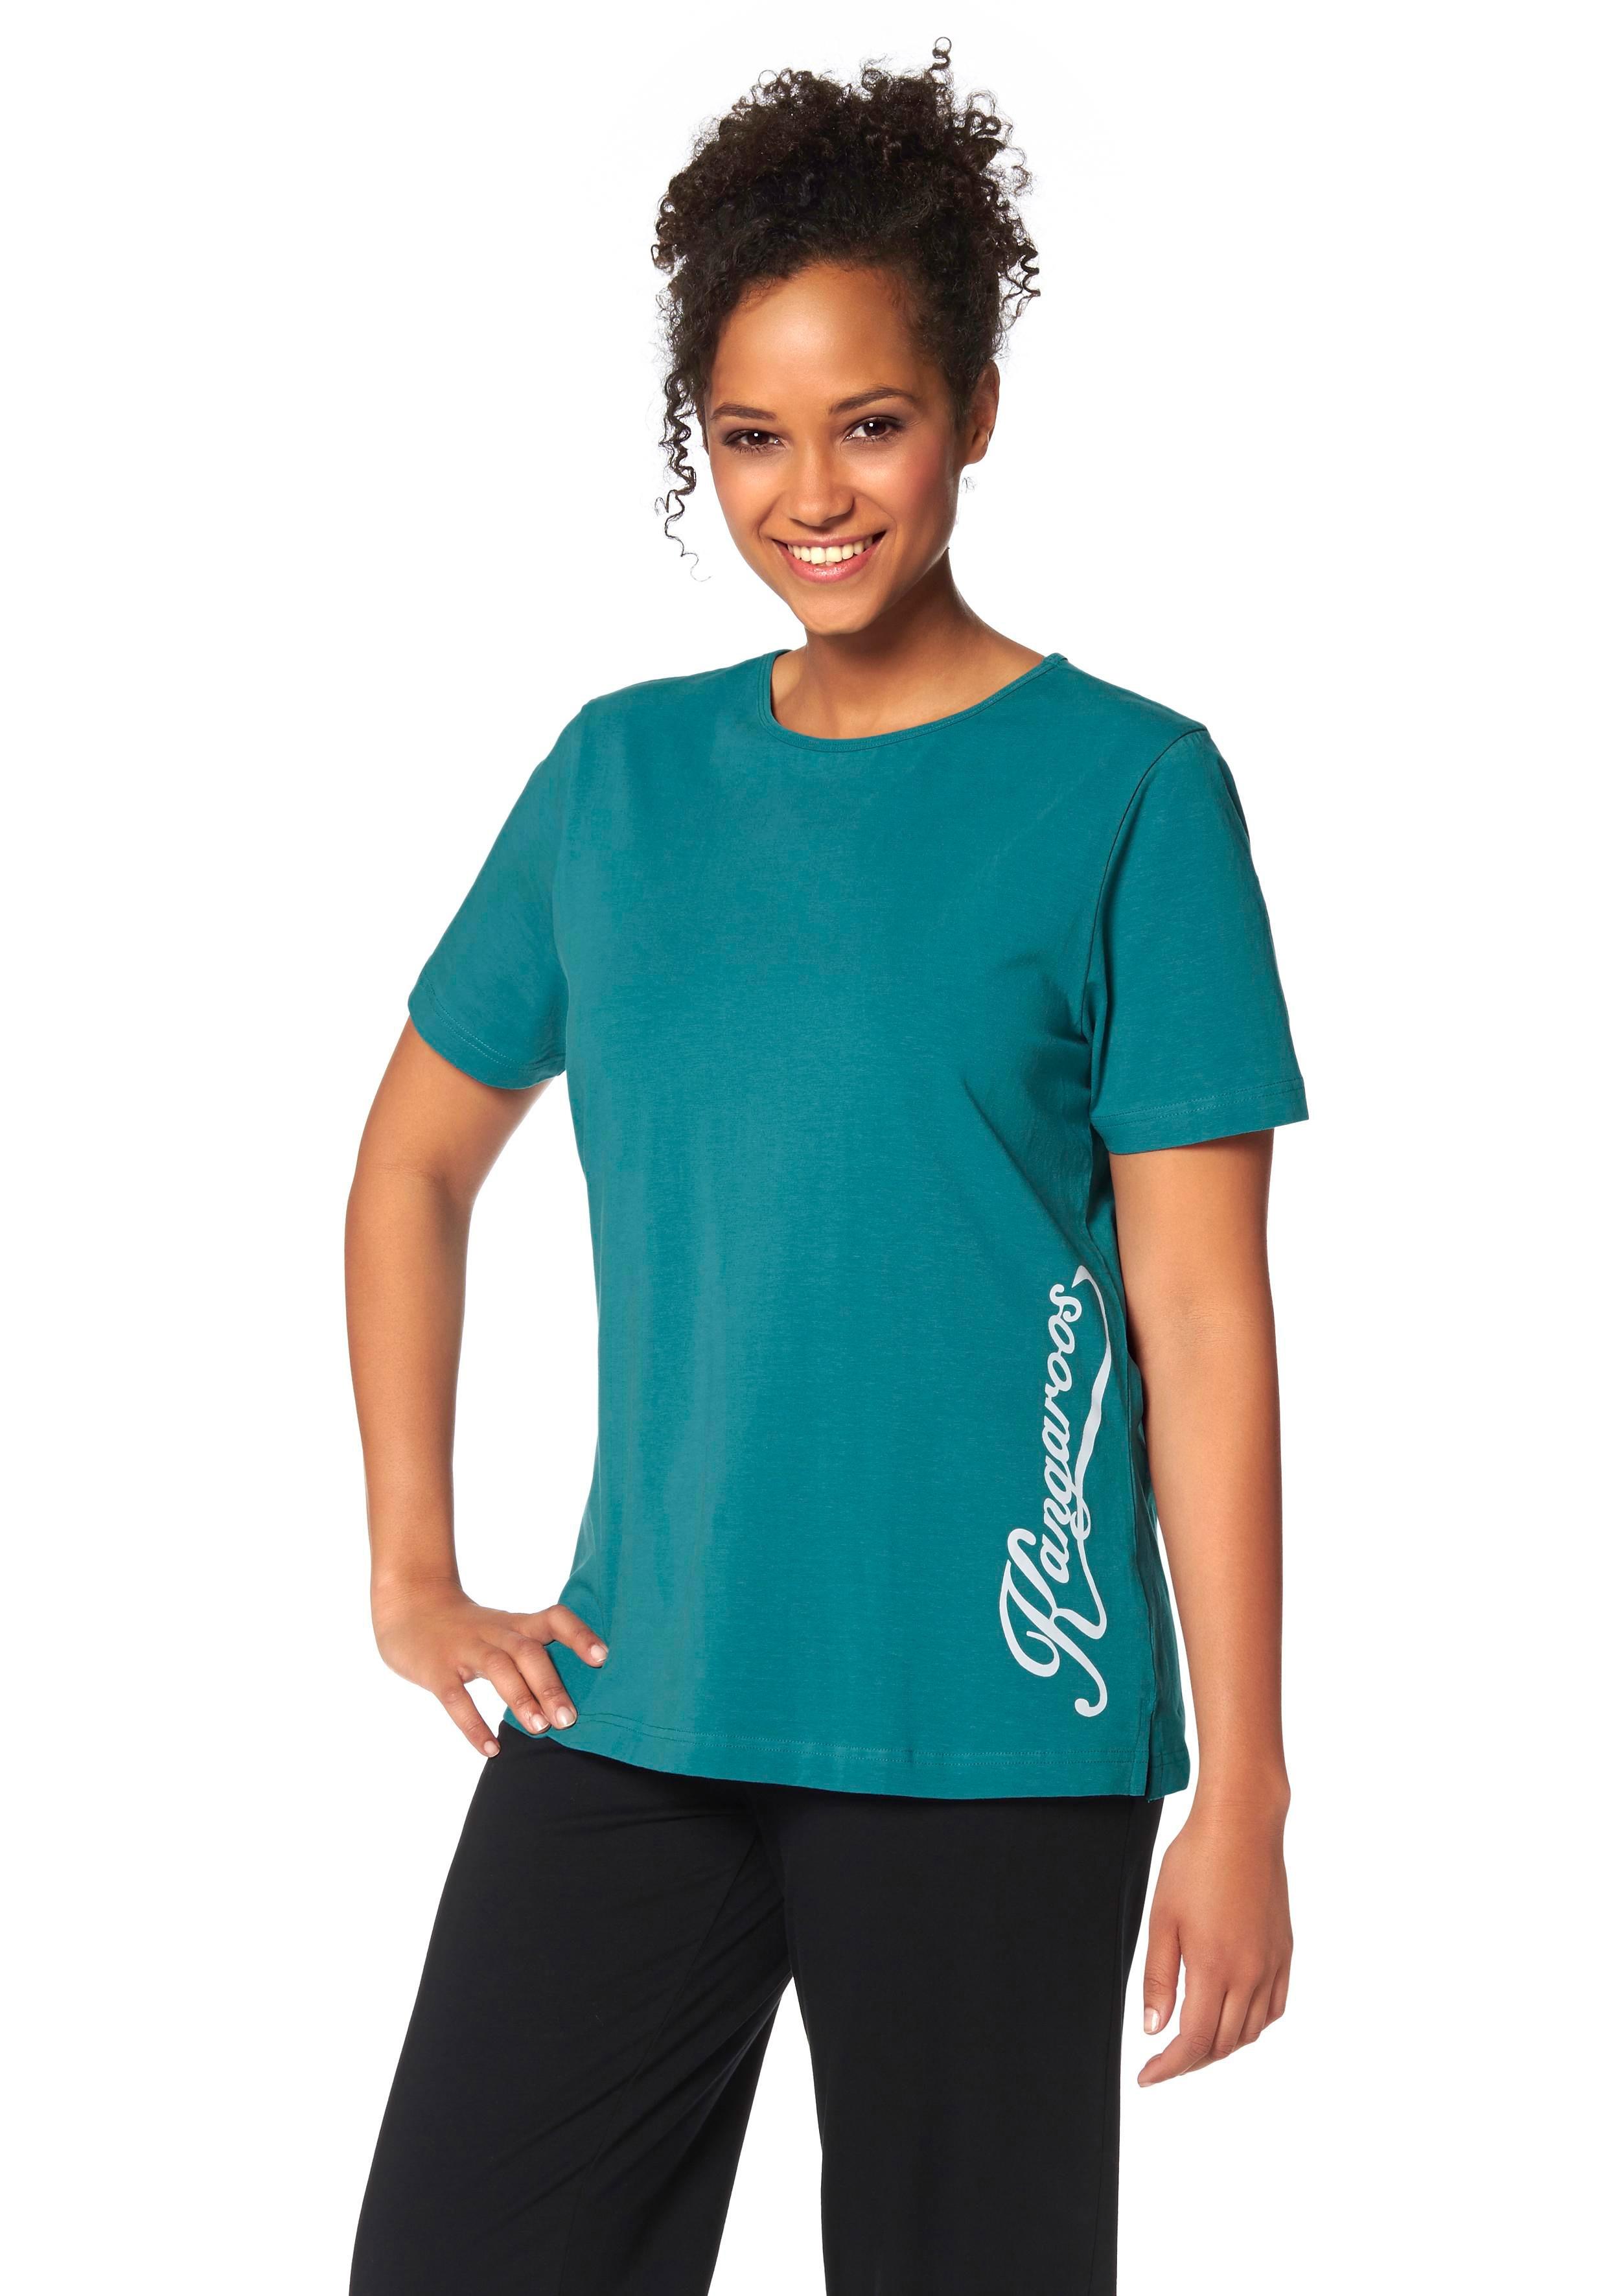 KangaROOS T-shirt - gratis ruilen op otto.nl